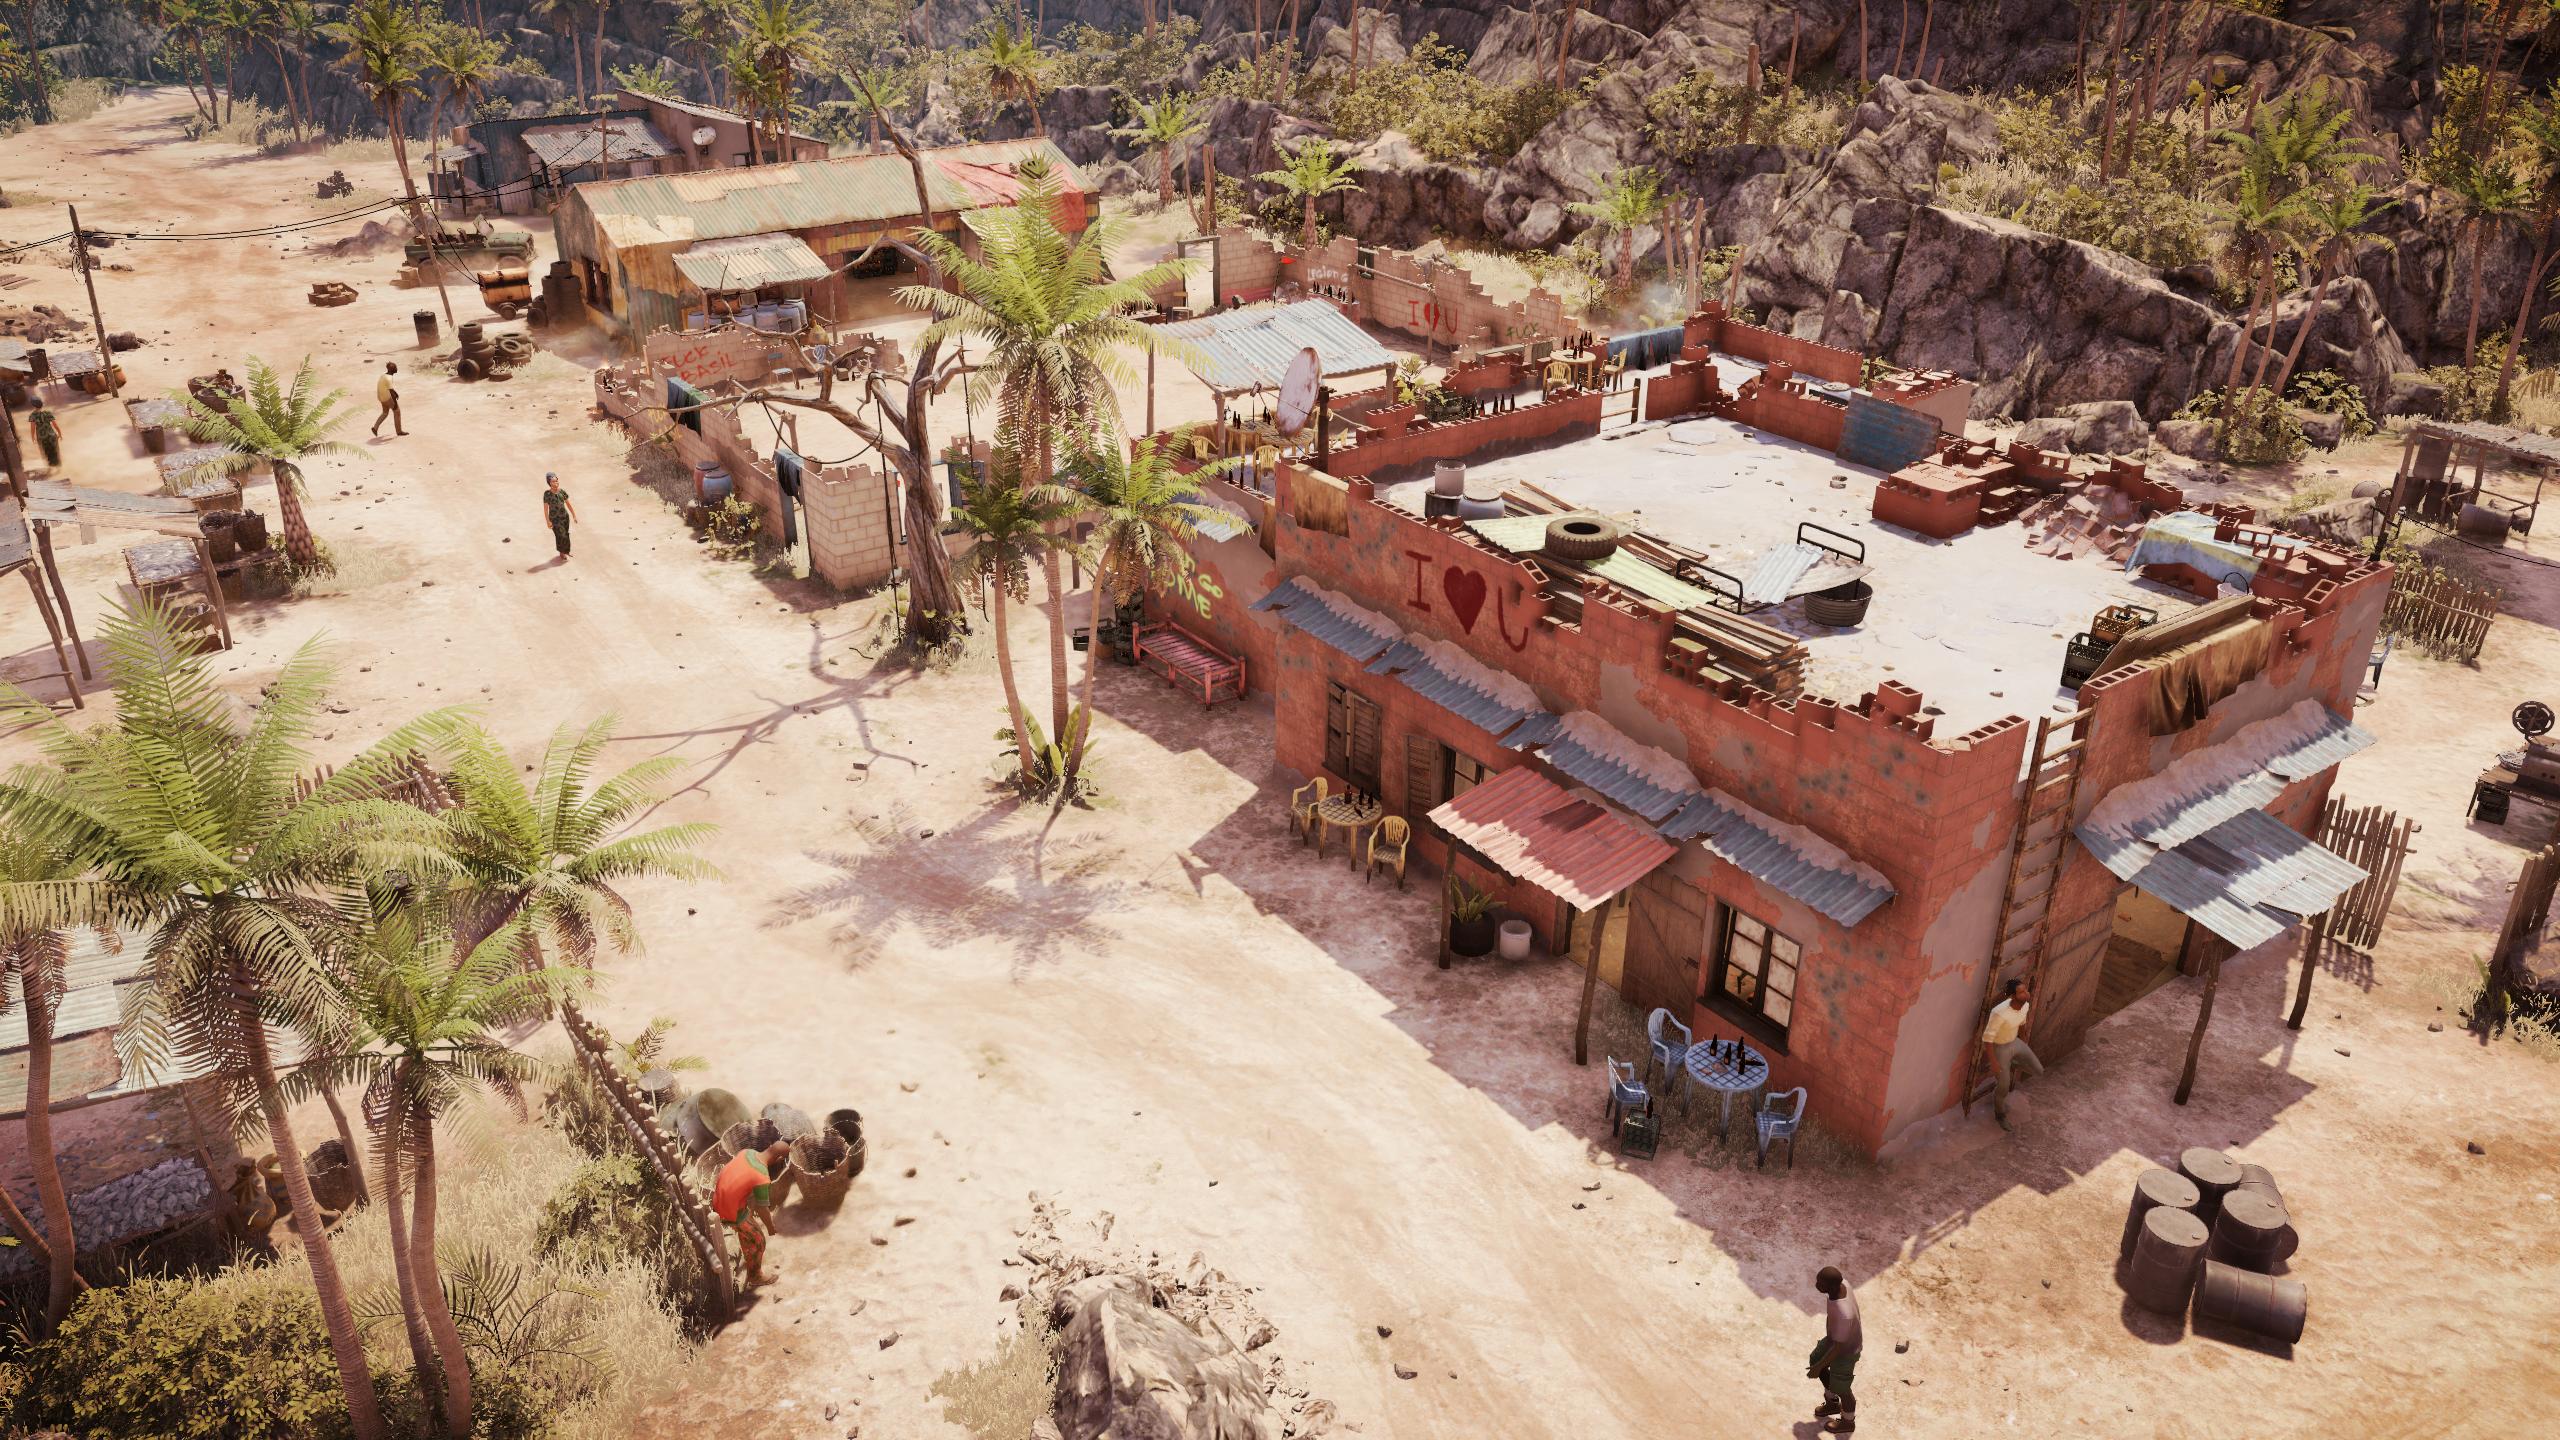 Screenshot from Jagged Alliance 3